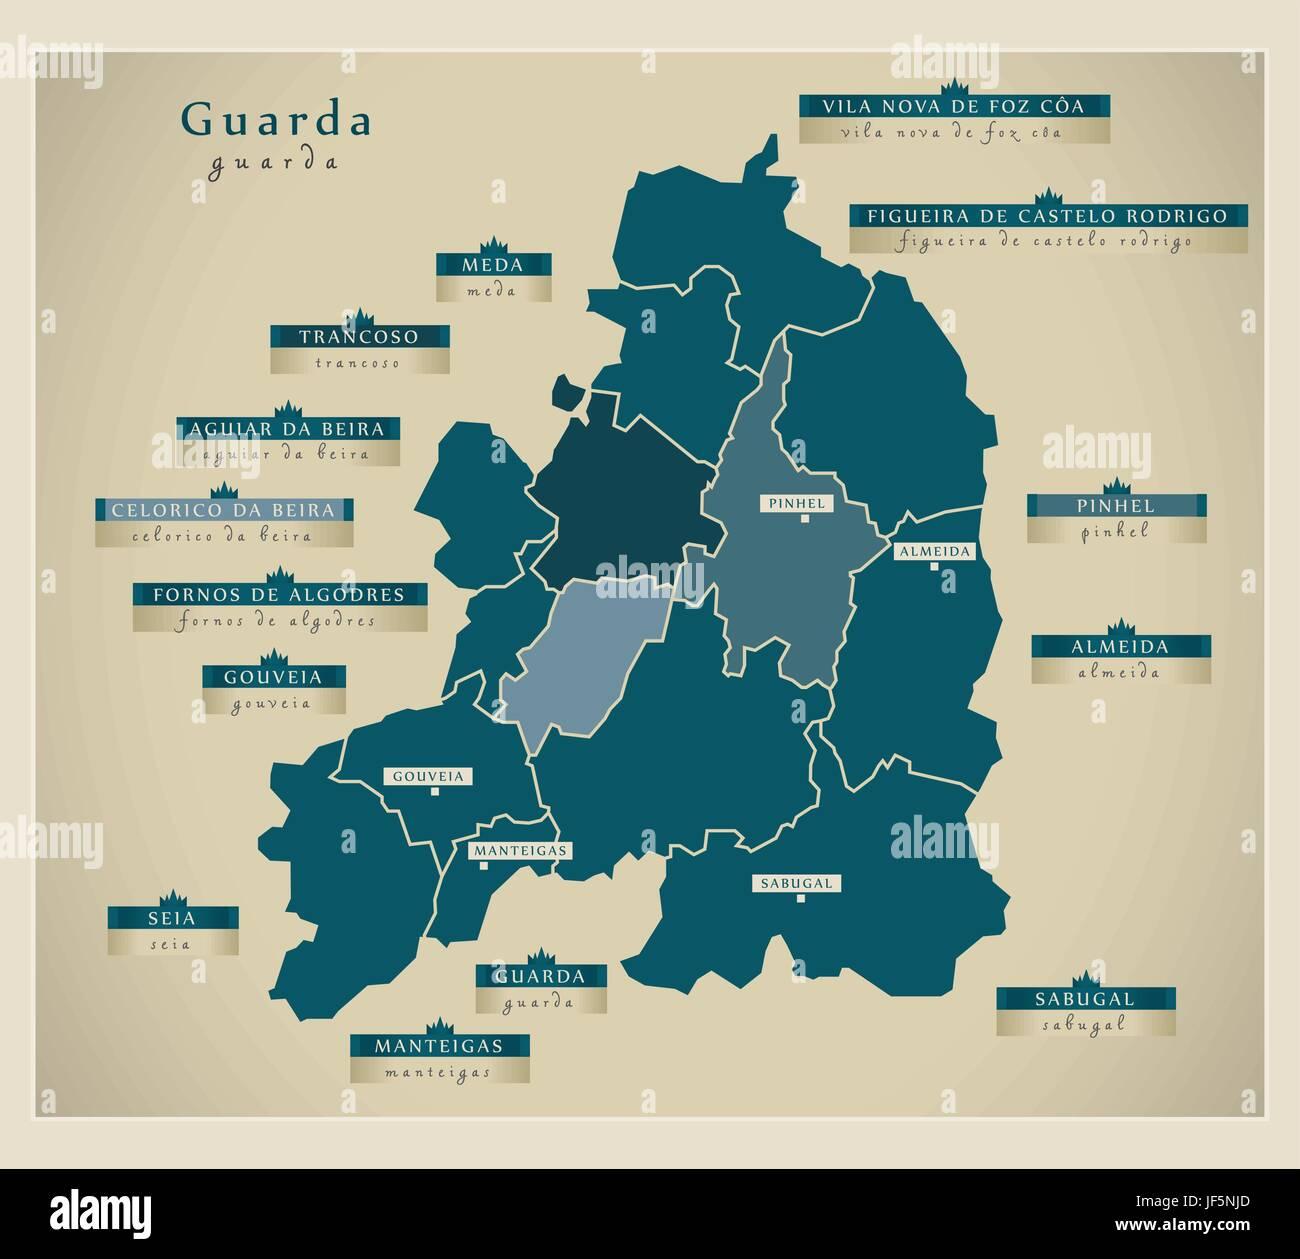 modern map - guarda pt - Stock Image